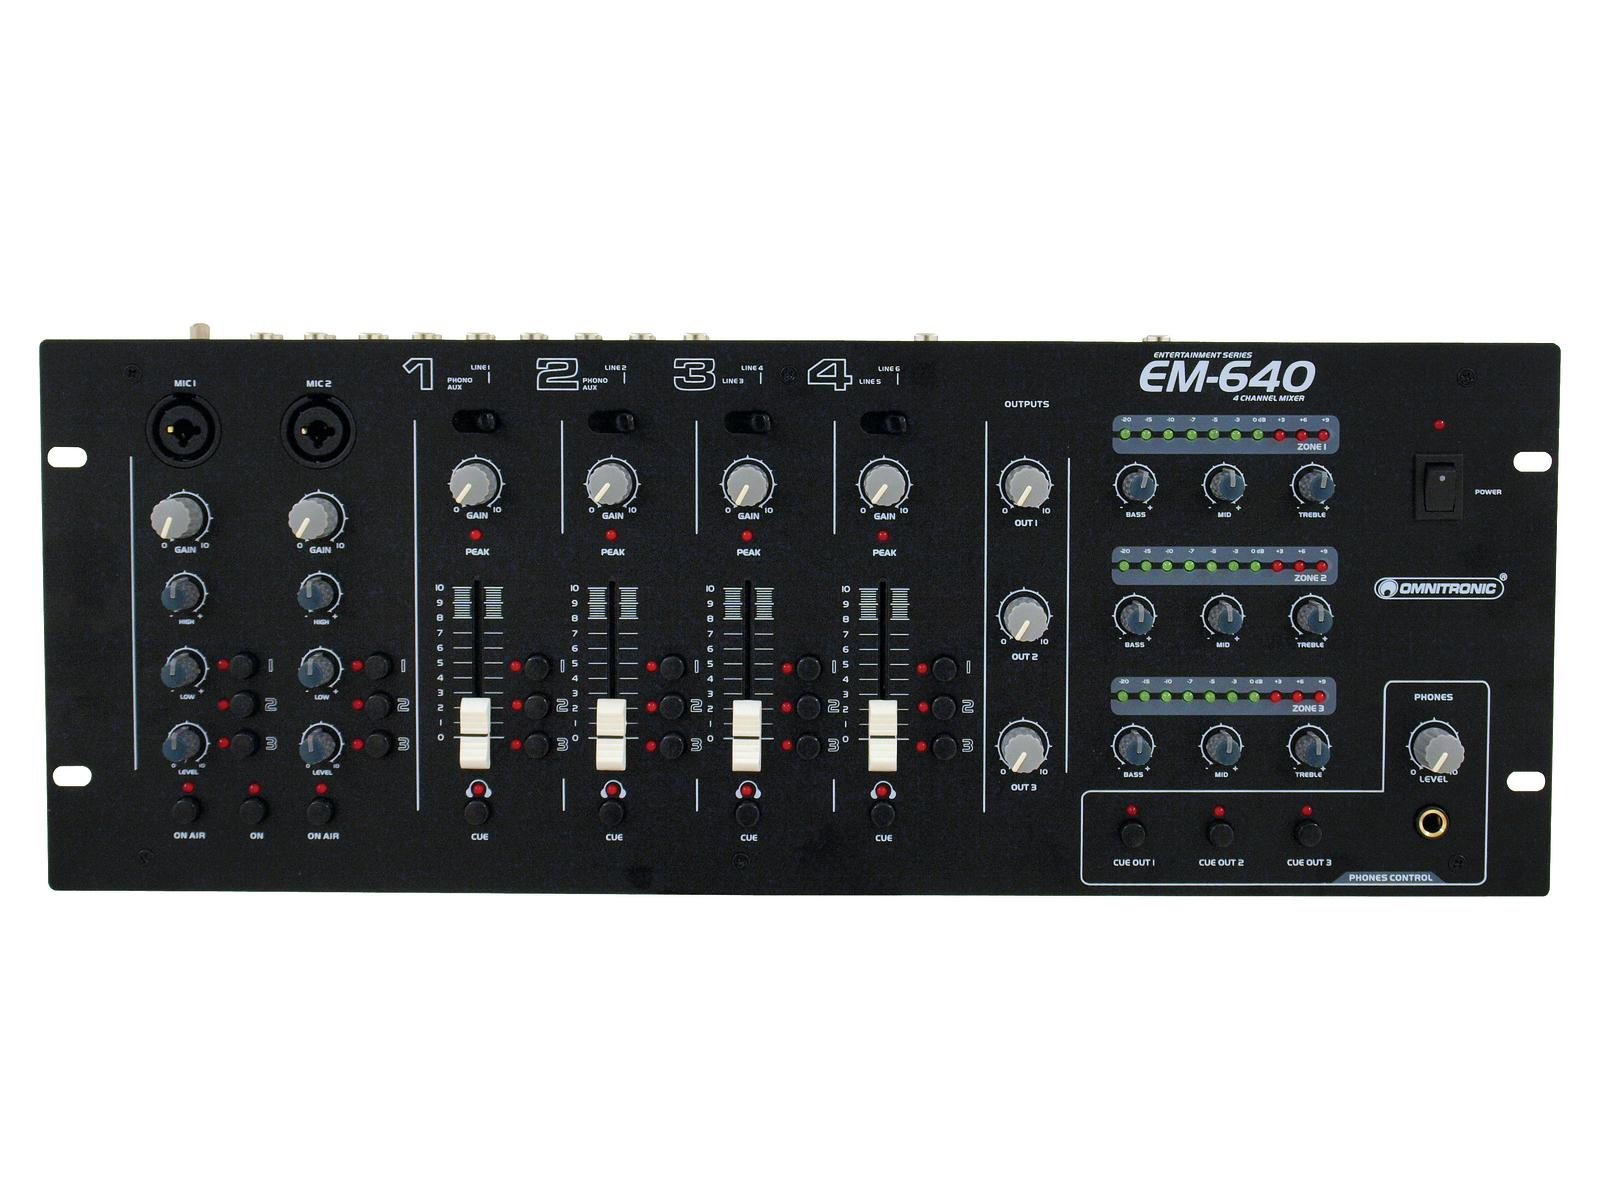 OMNITRONIC EM-640B Intrattenimento mixer